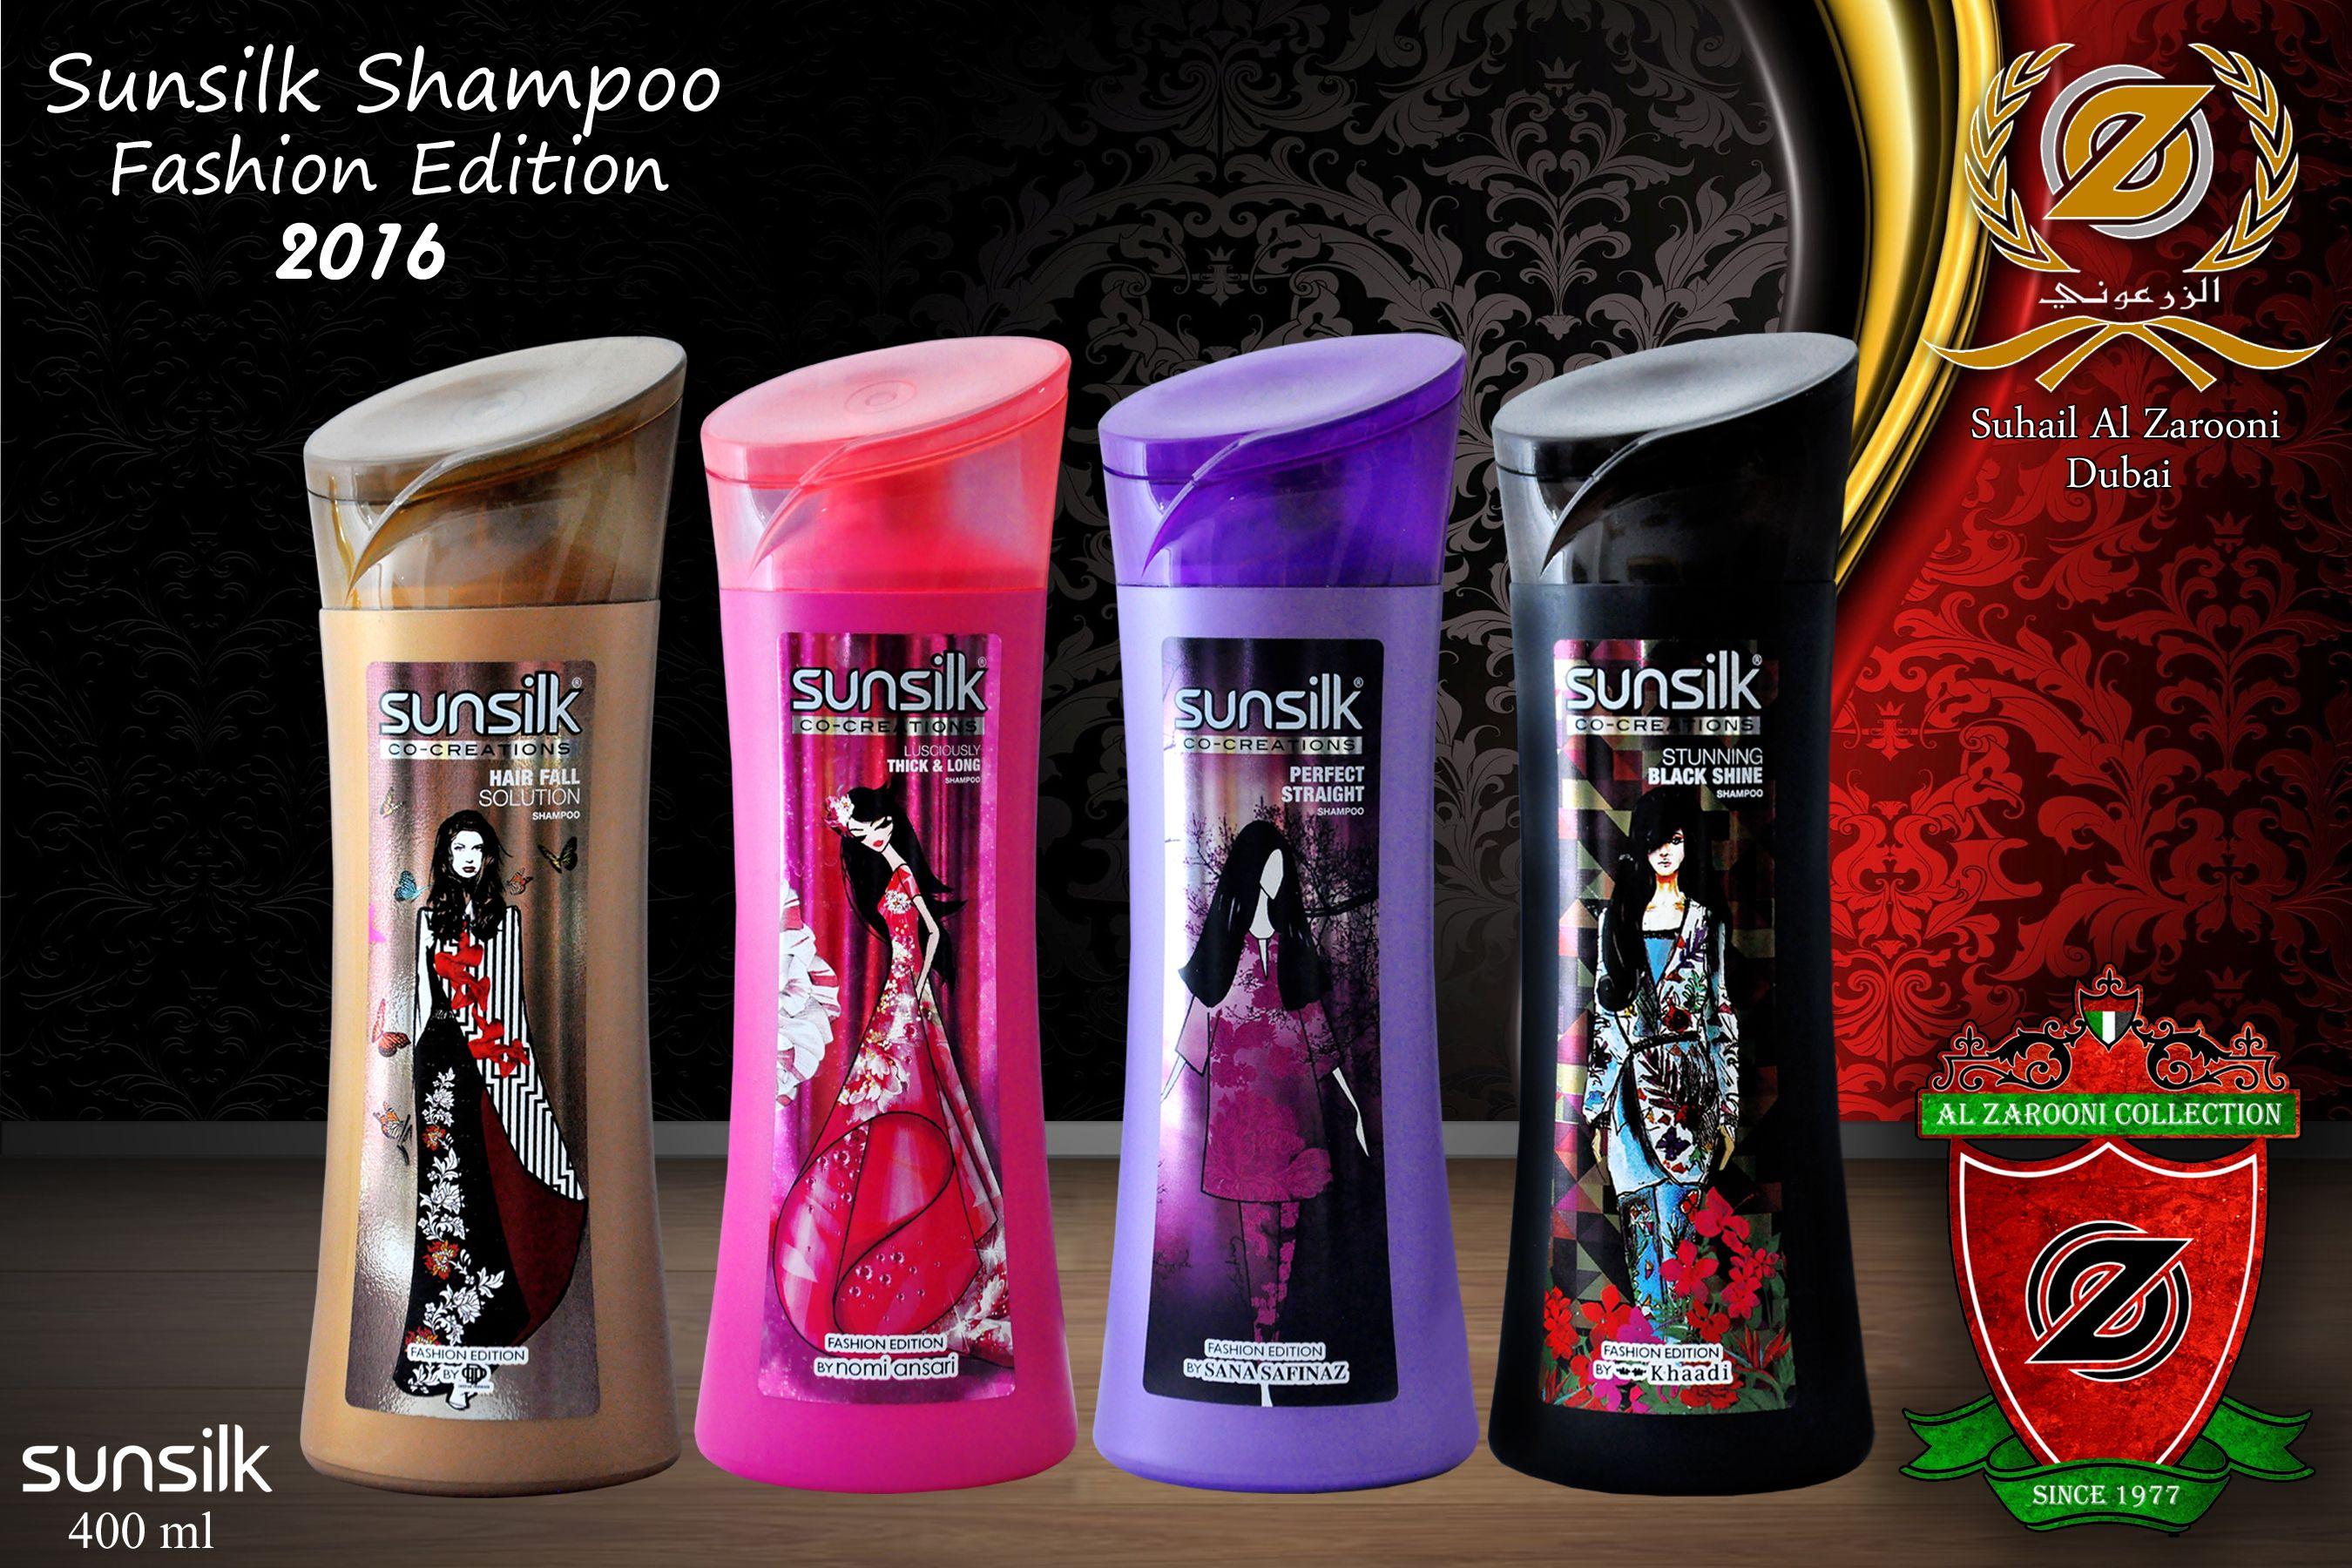 Sunsilk Shampoo Unilever brand Hair Care Perfect